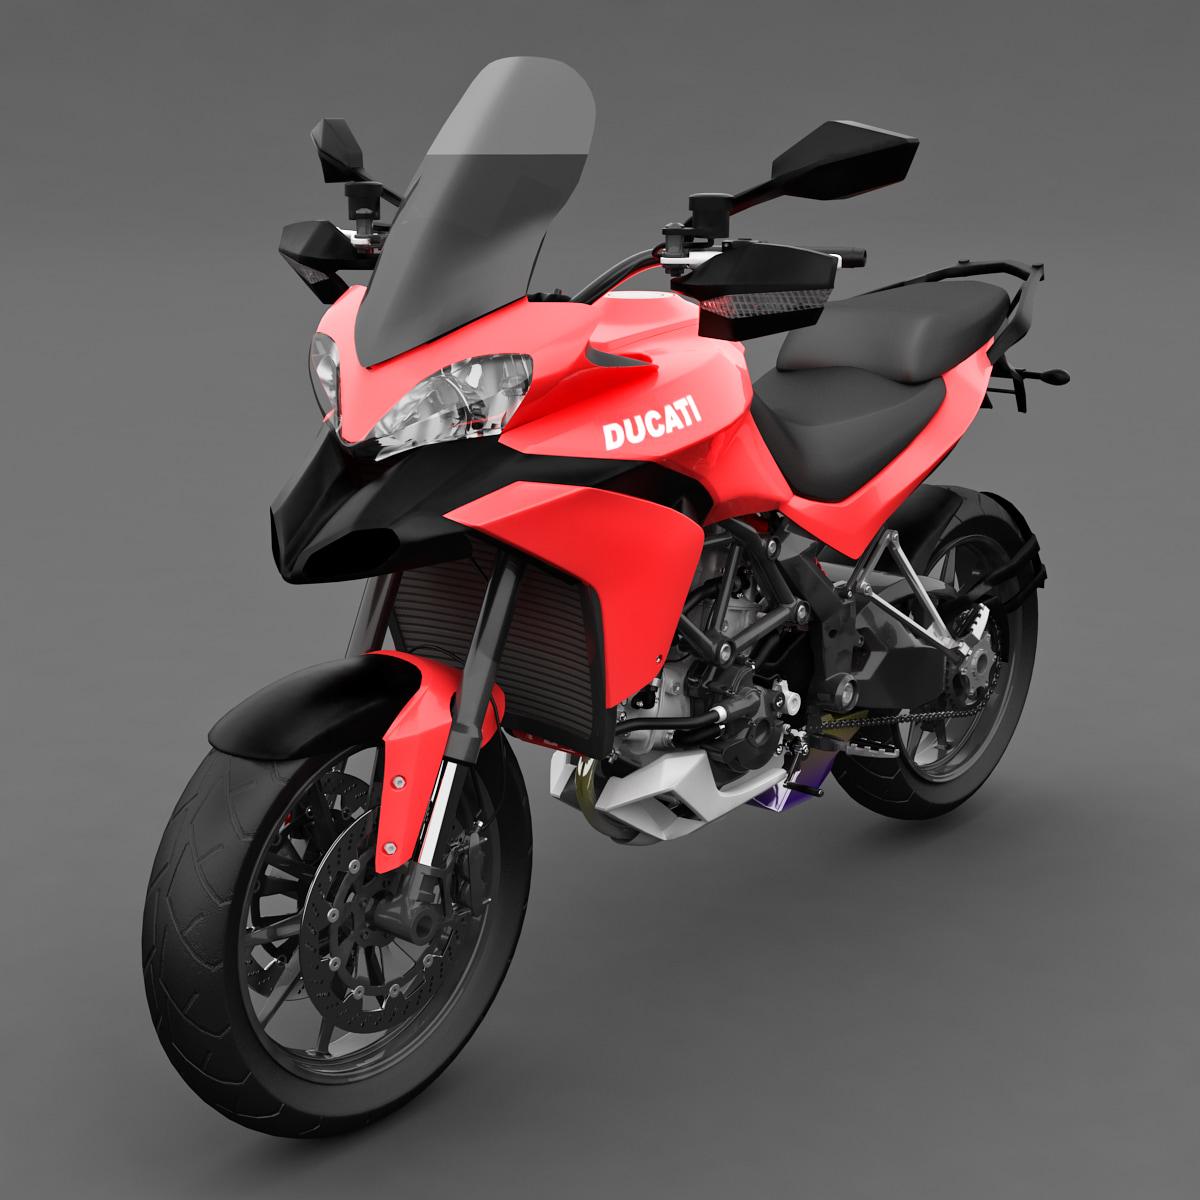 Ducati_Multistrada_1200s_01.jpg